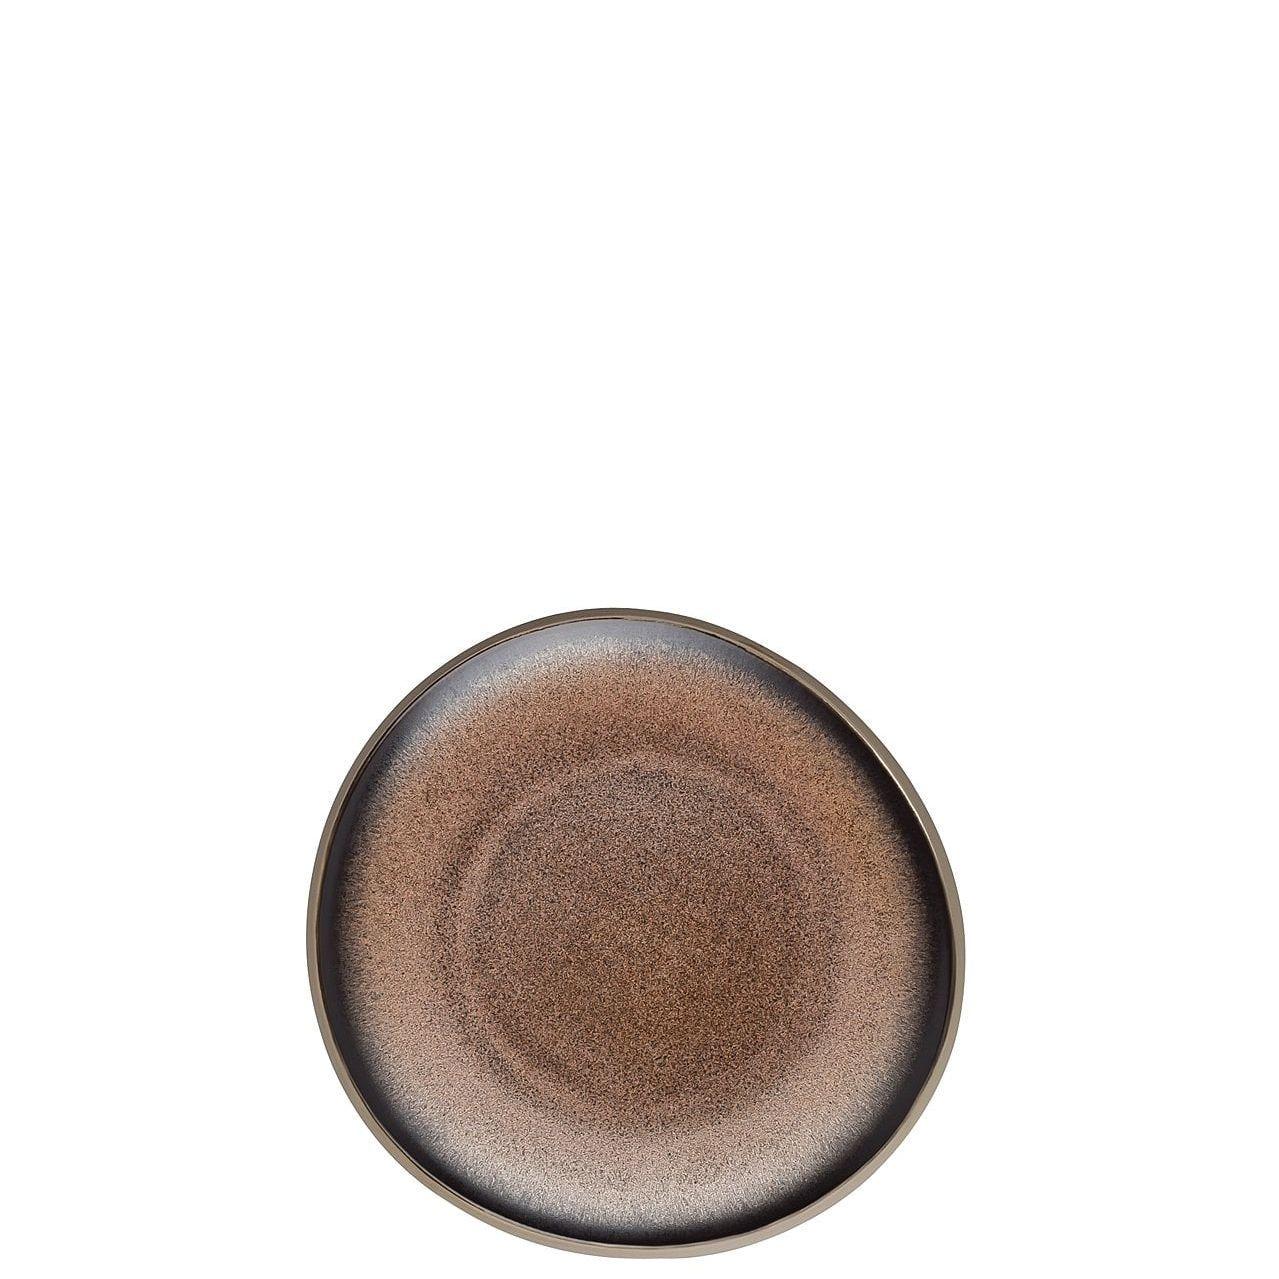 Rosenthal Junto gebaksbordje ø 16cm - bronze